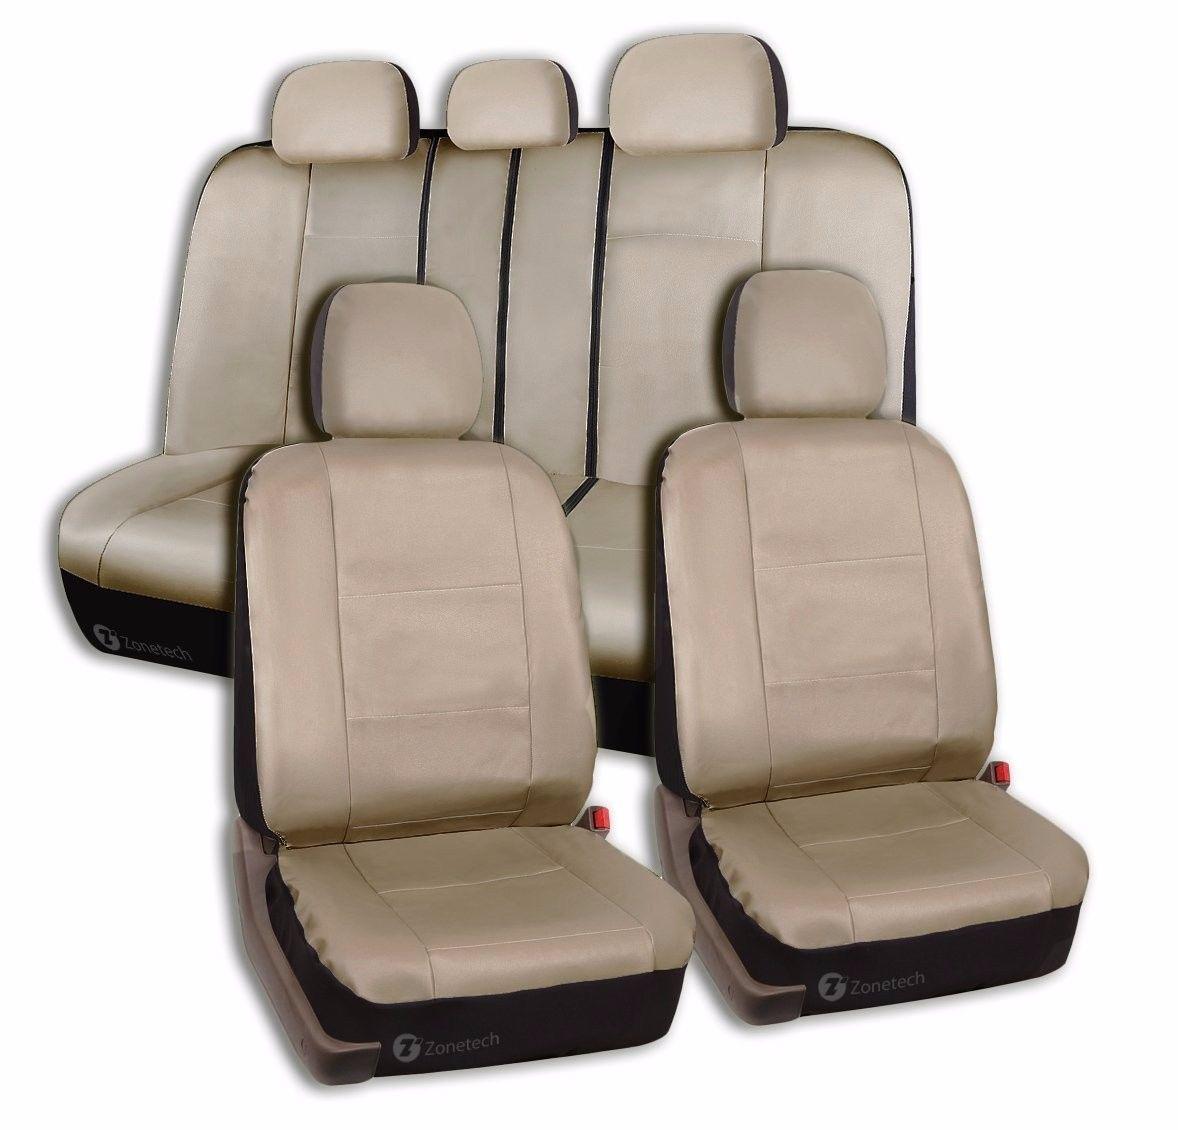 Zone Tech Luxury Universal Fit Interior Decor PU Leather Car Seat Cove